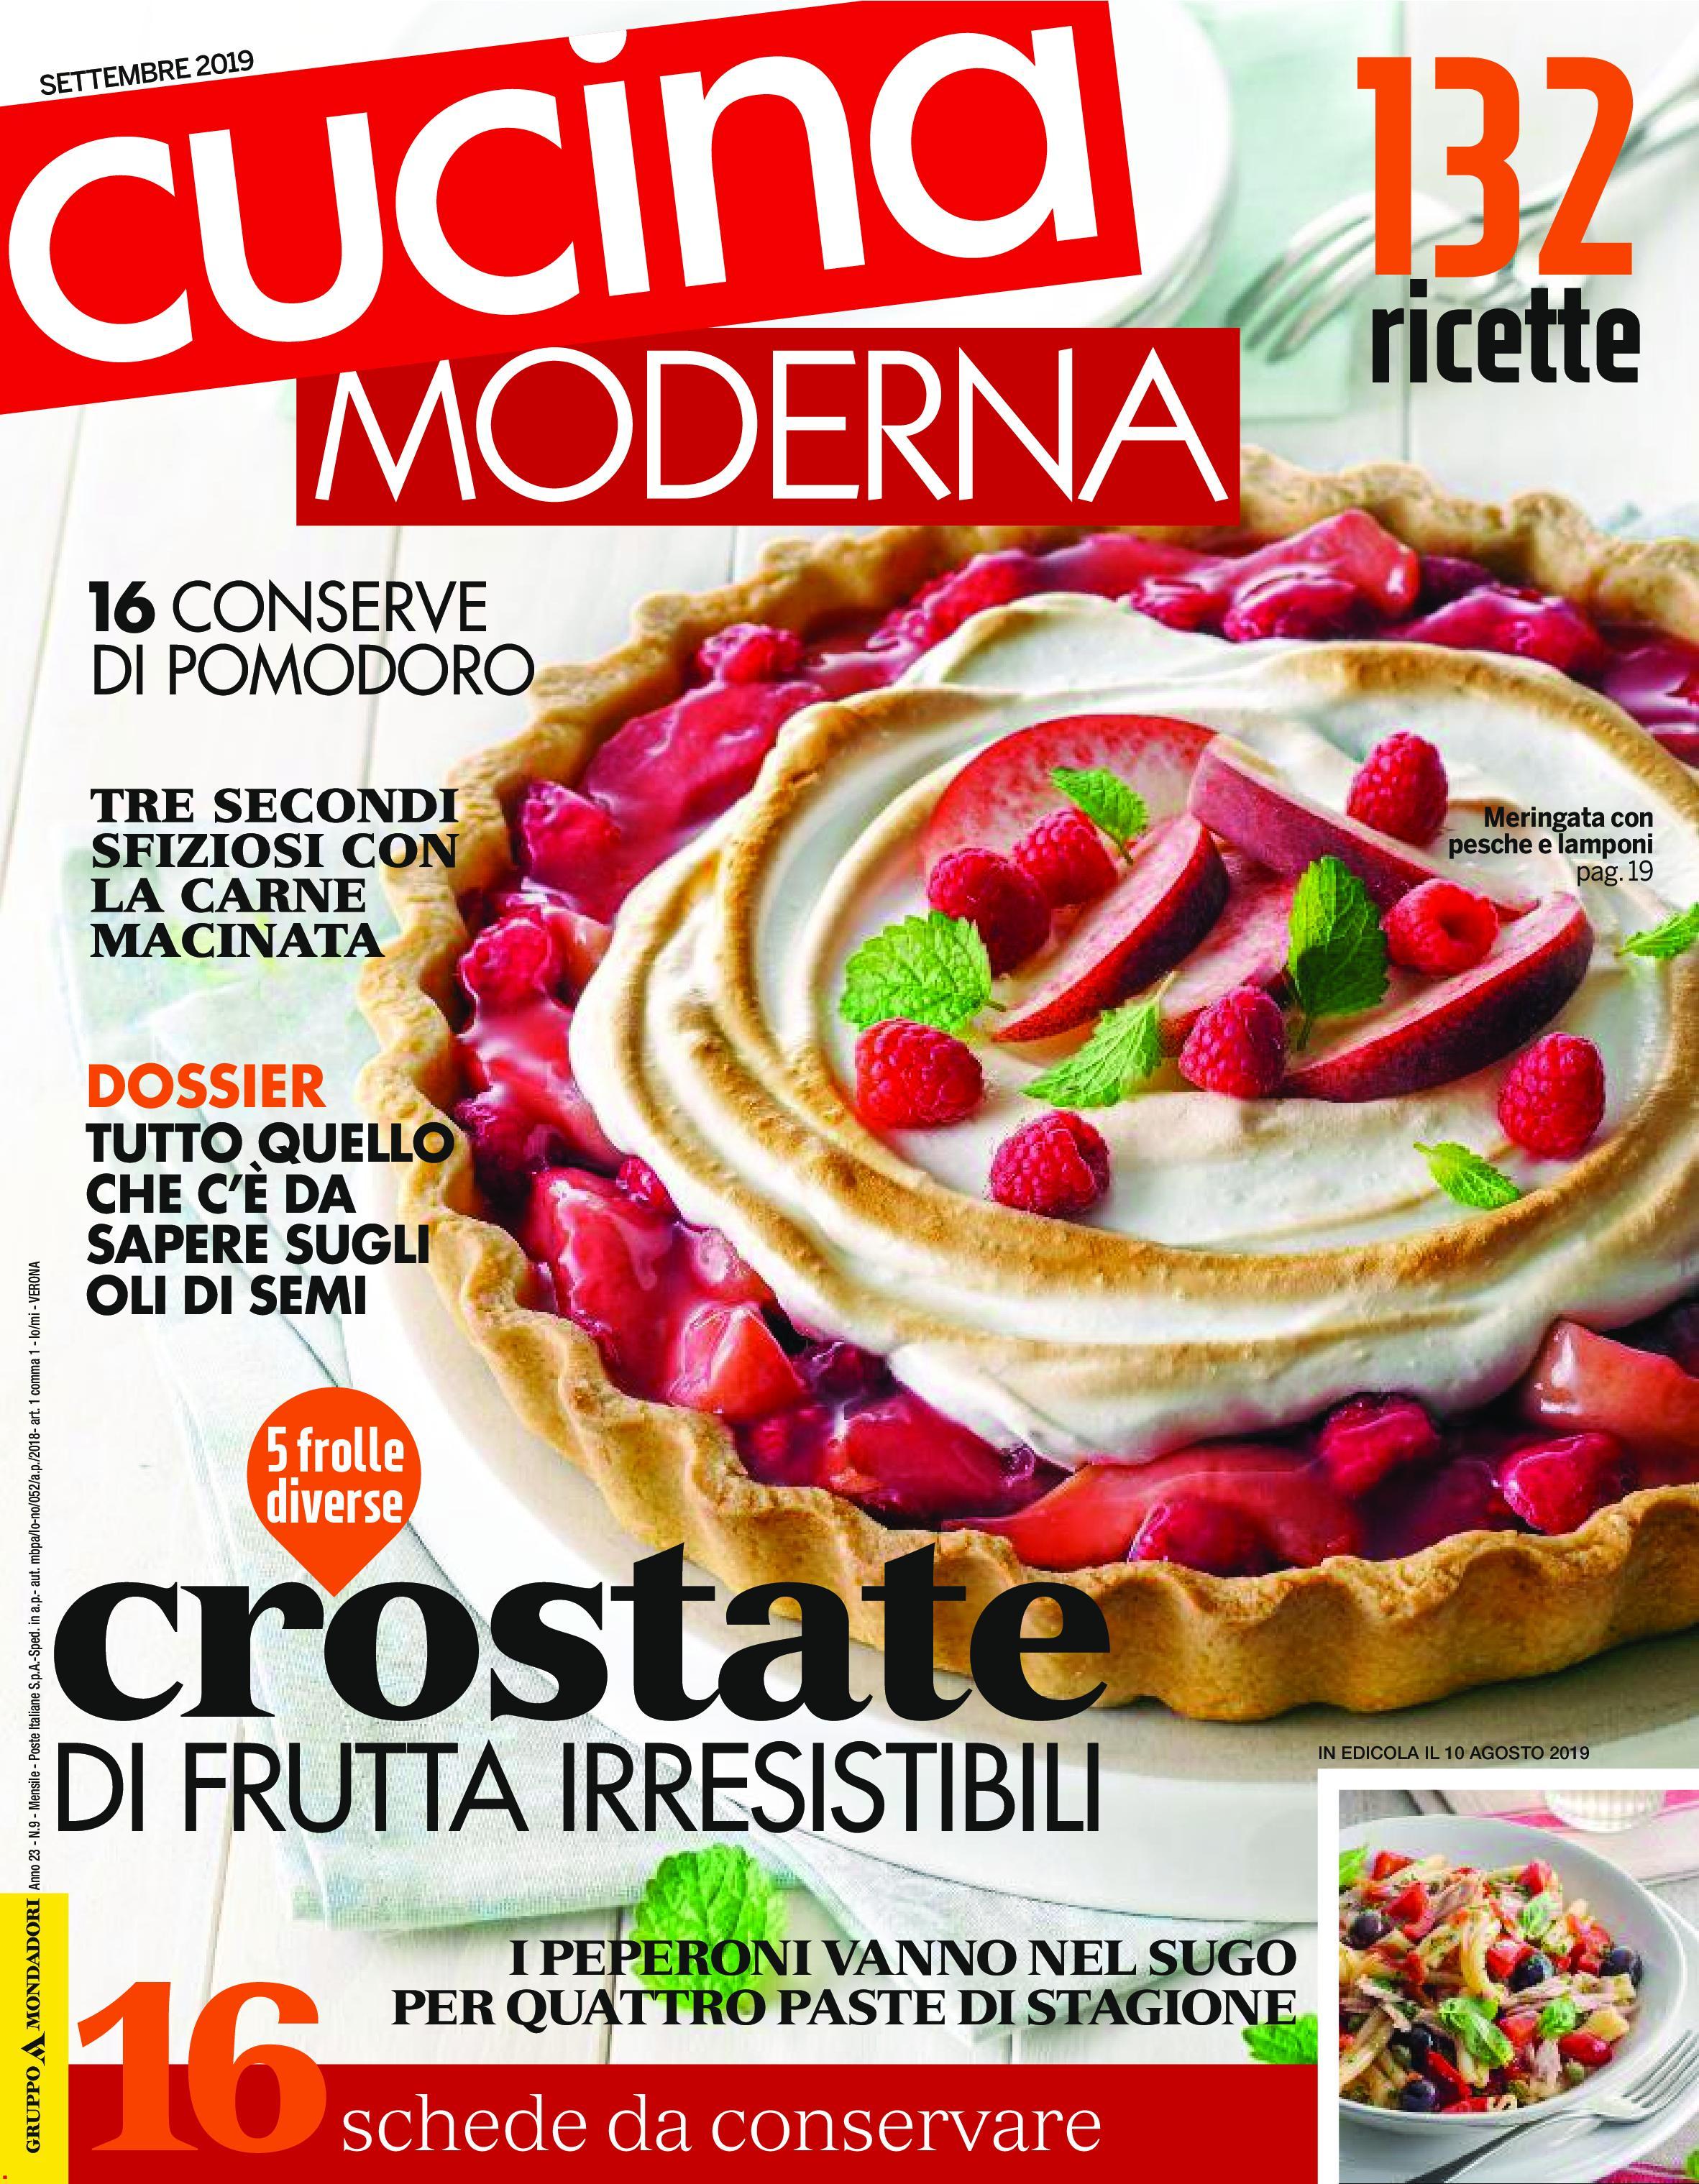 Cucina Moderna - Settembre 2019